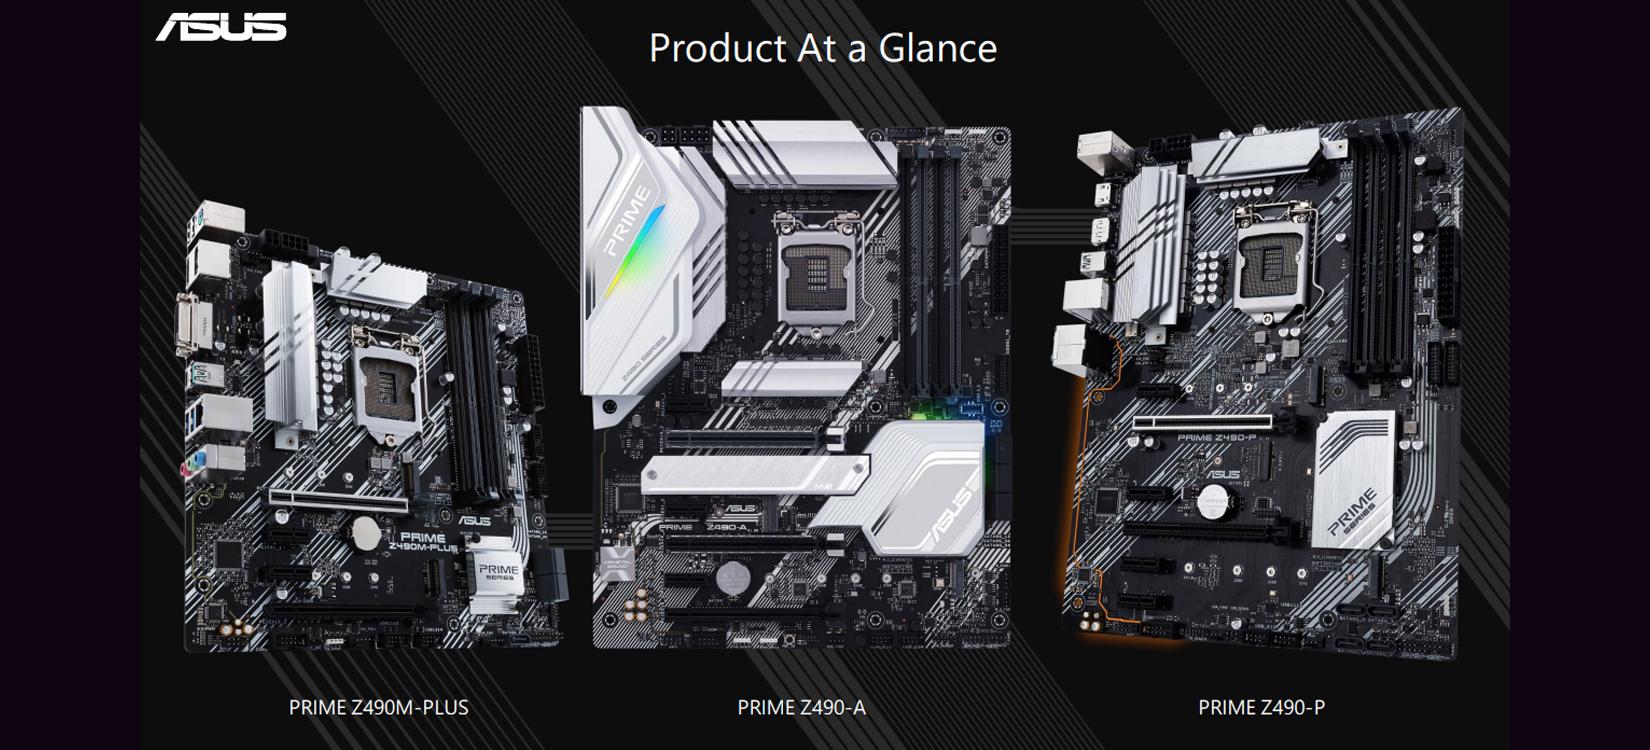 Mainboard ASUS PRIME Z490-A (Intel Z490, Socket 1200, ATX, 4 khe RAM DDR4)